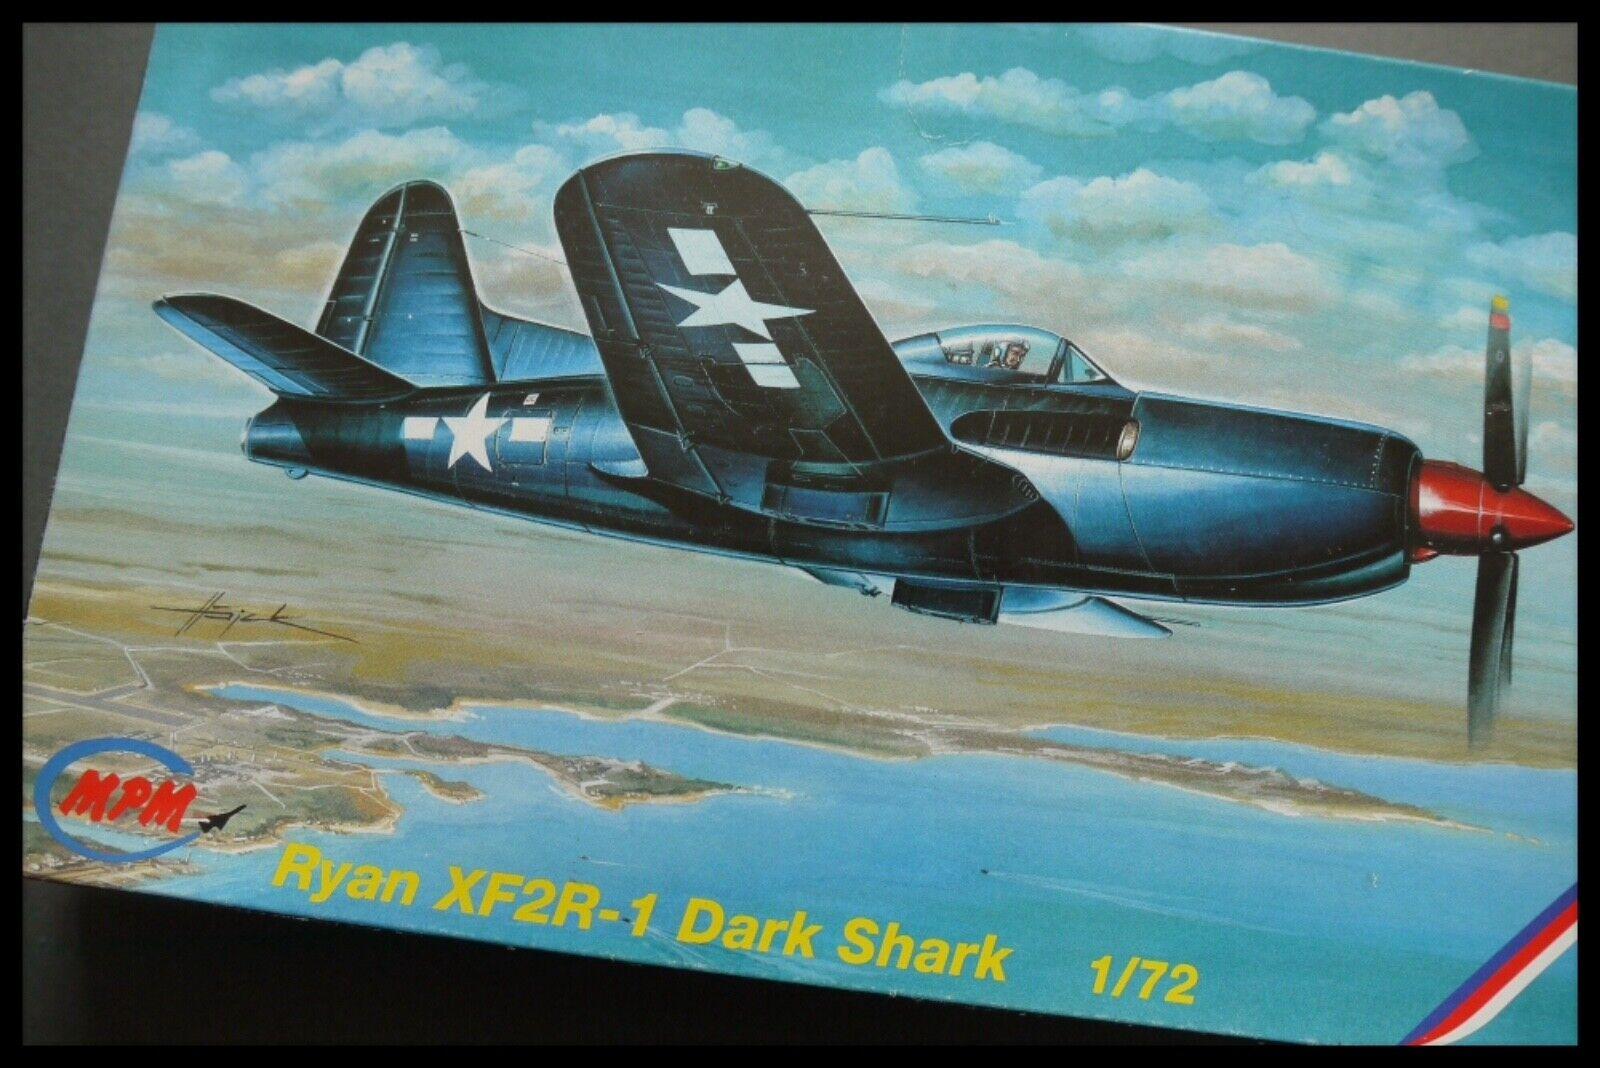 MPM Ryan XF2R-1 Dark Shark 1 72 Model Kit